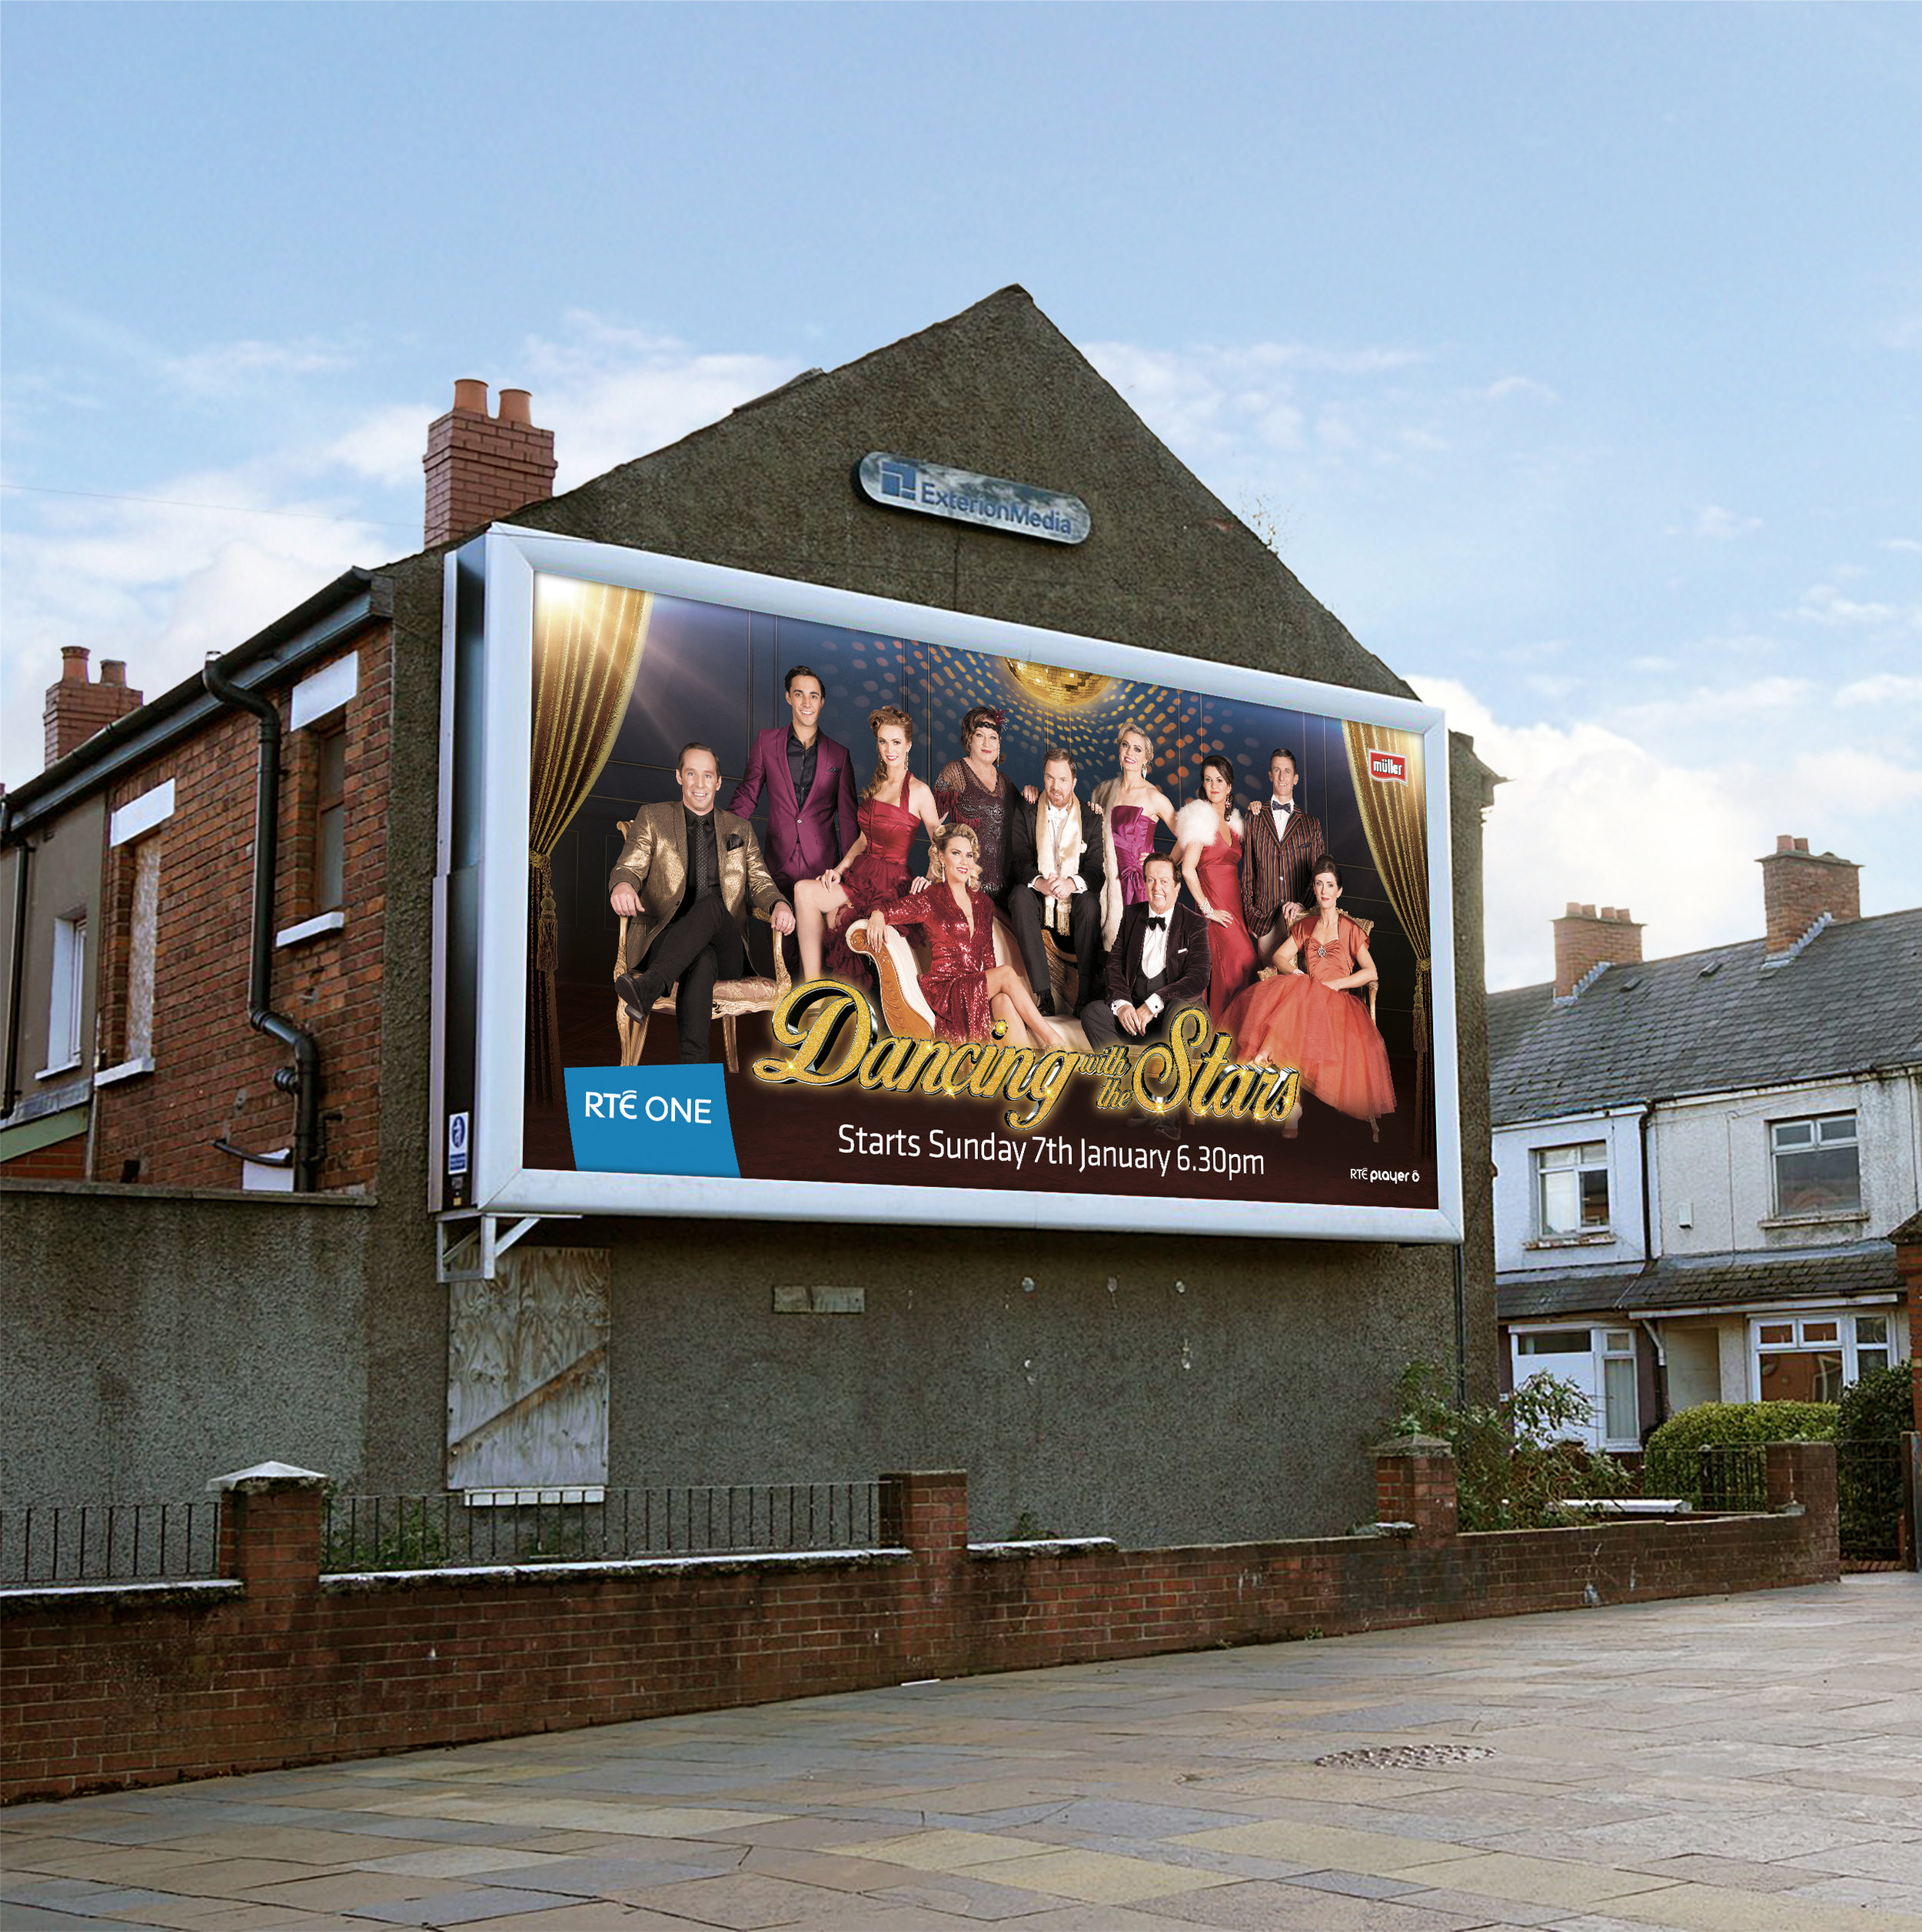 48-sheet-billboard-mock-up-02-meetdean-.jpg